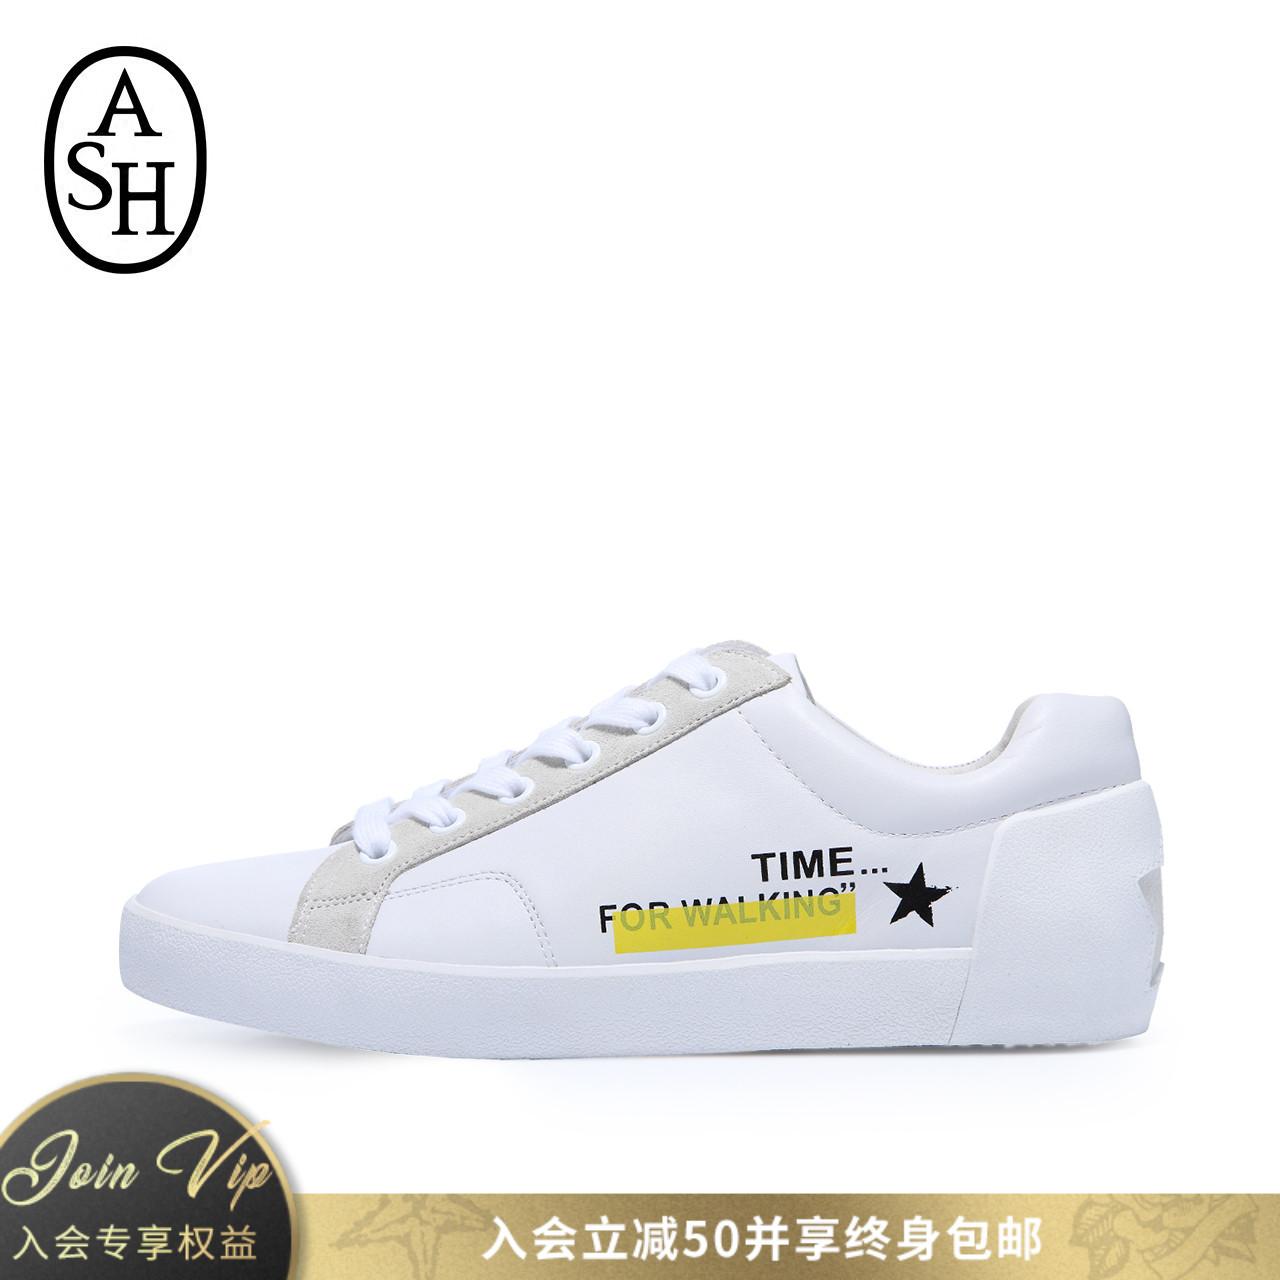 ASH女鞋2018秋季新品NEXT系列个性宣言涂鸦休闲低帮单鞋小白鞋